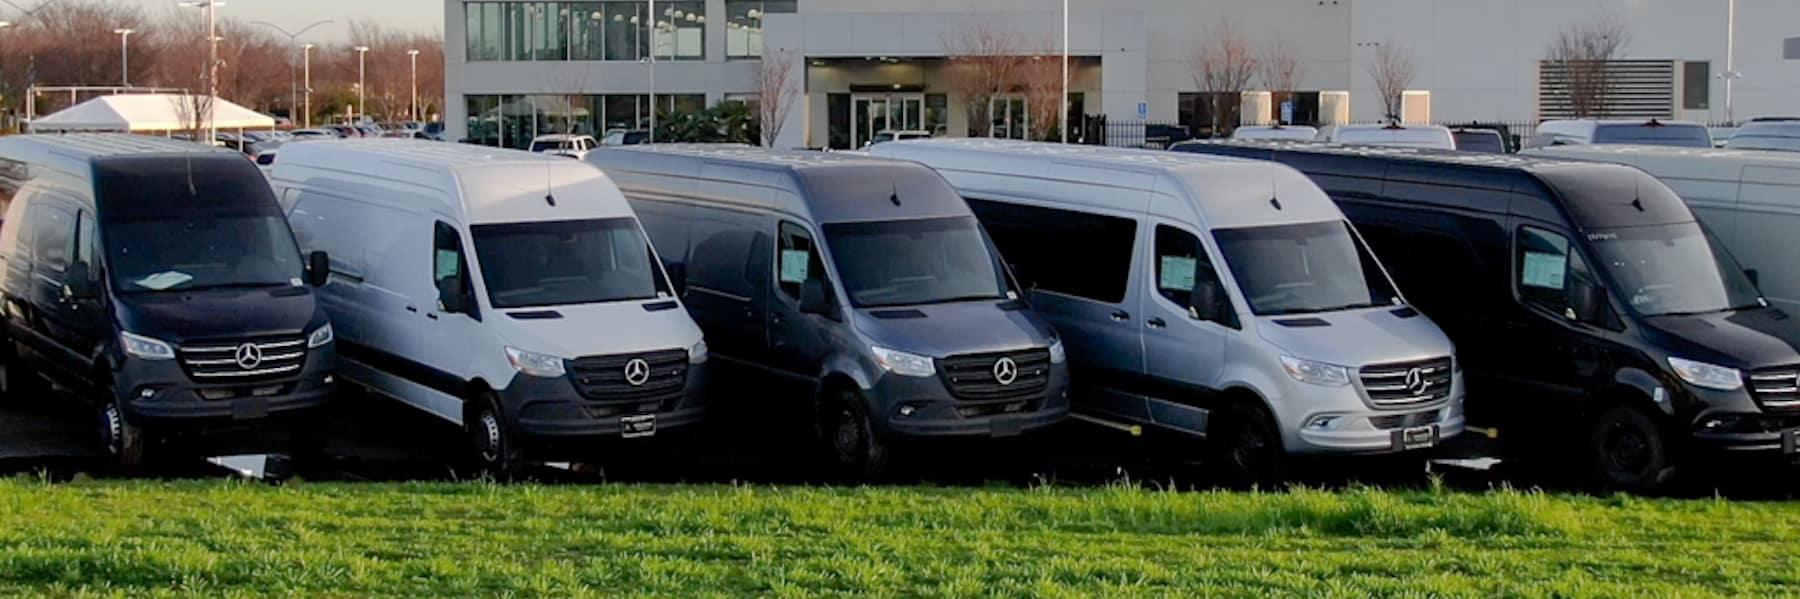 vans with grass